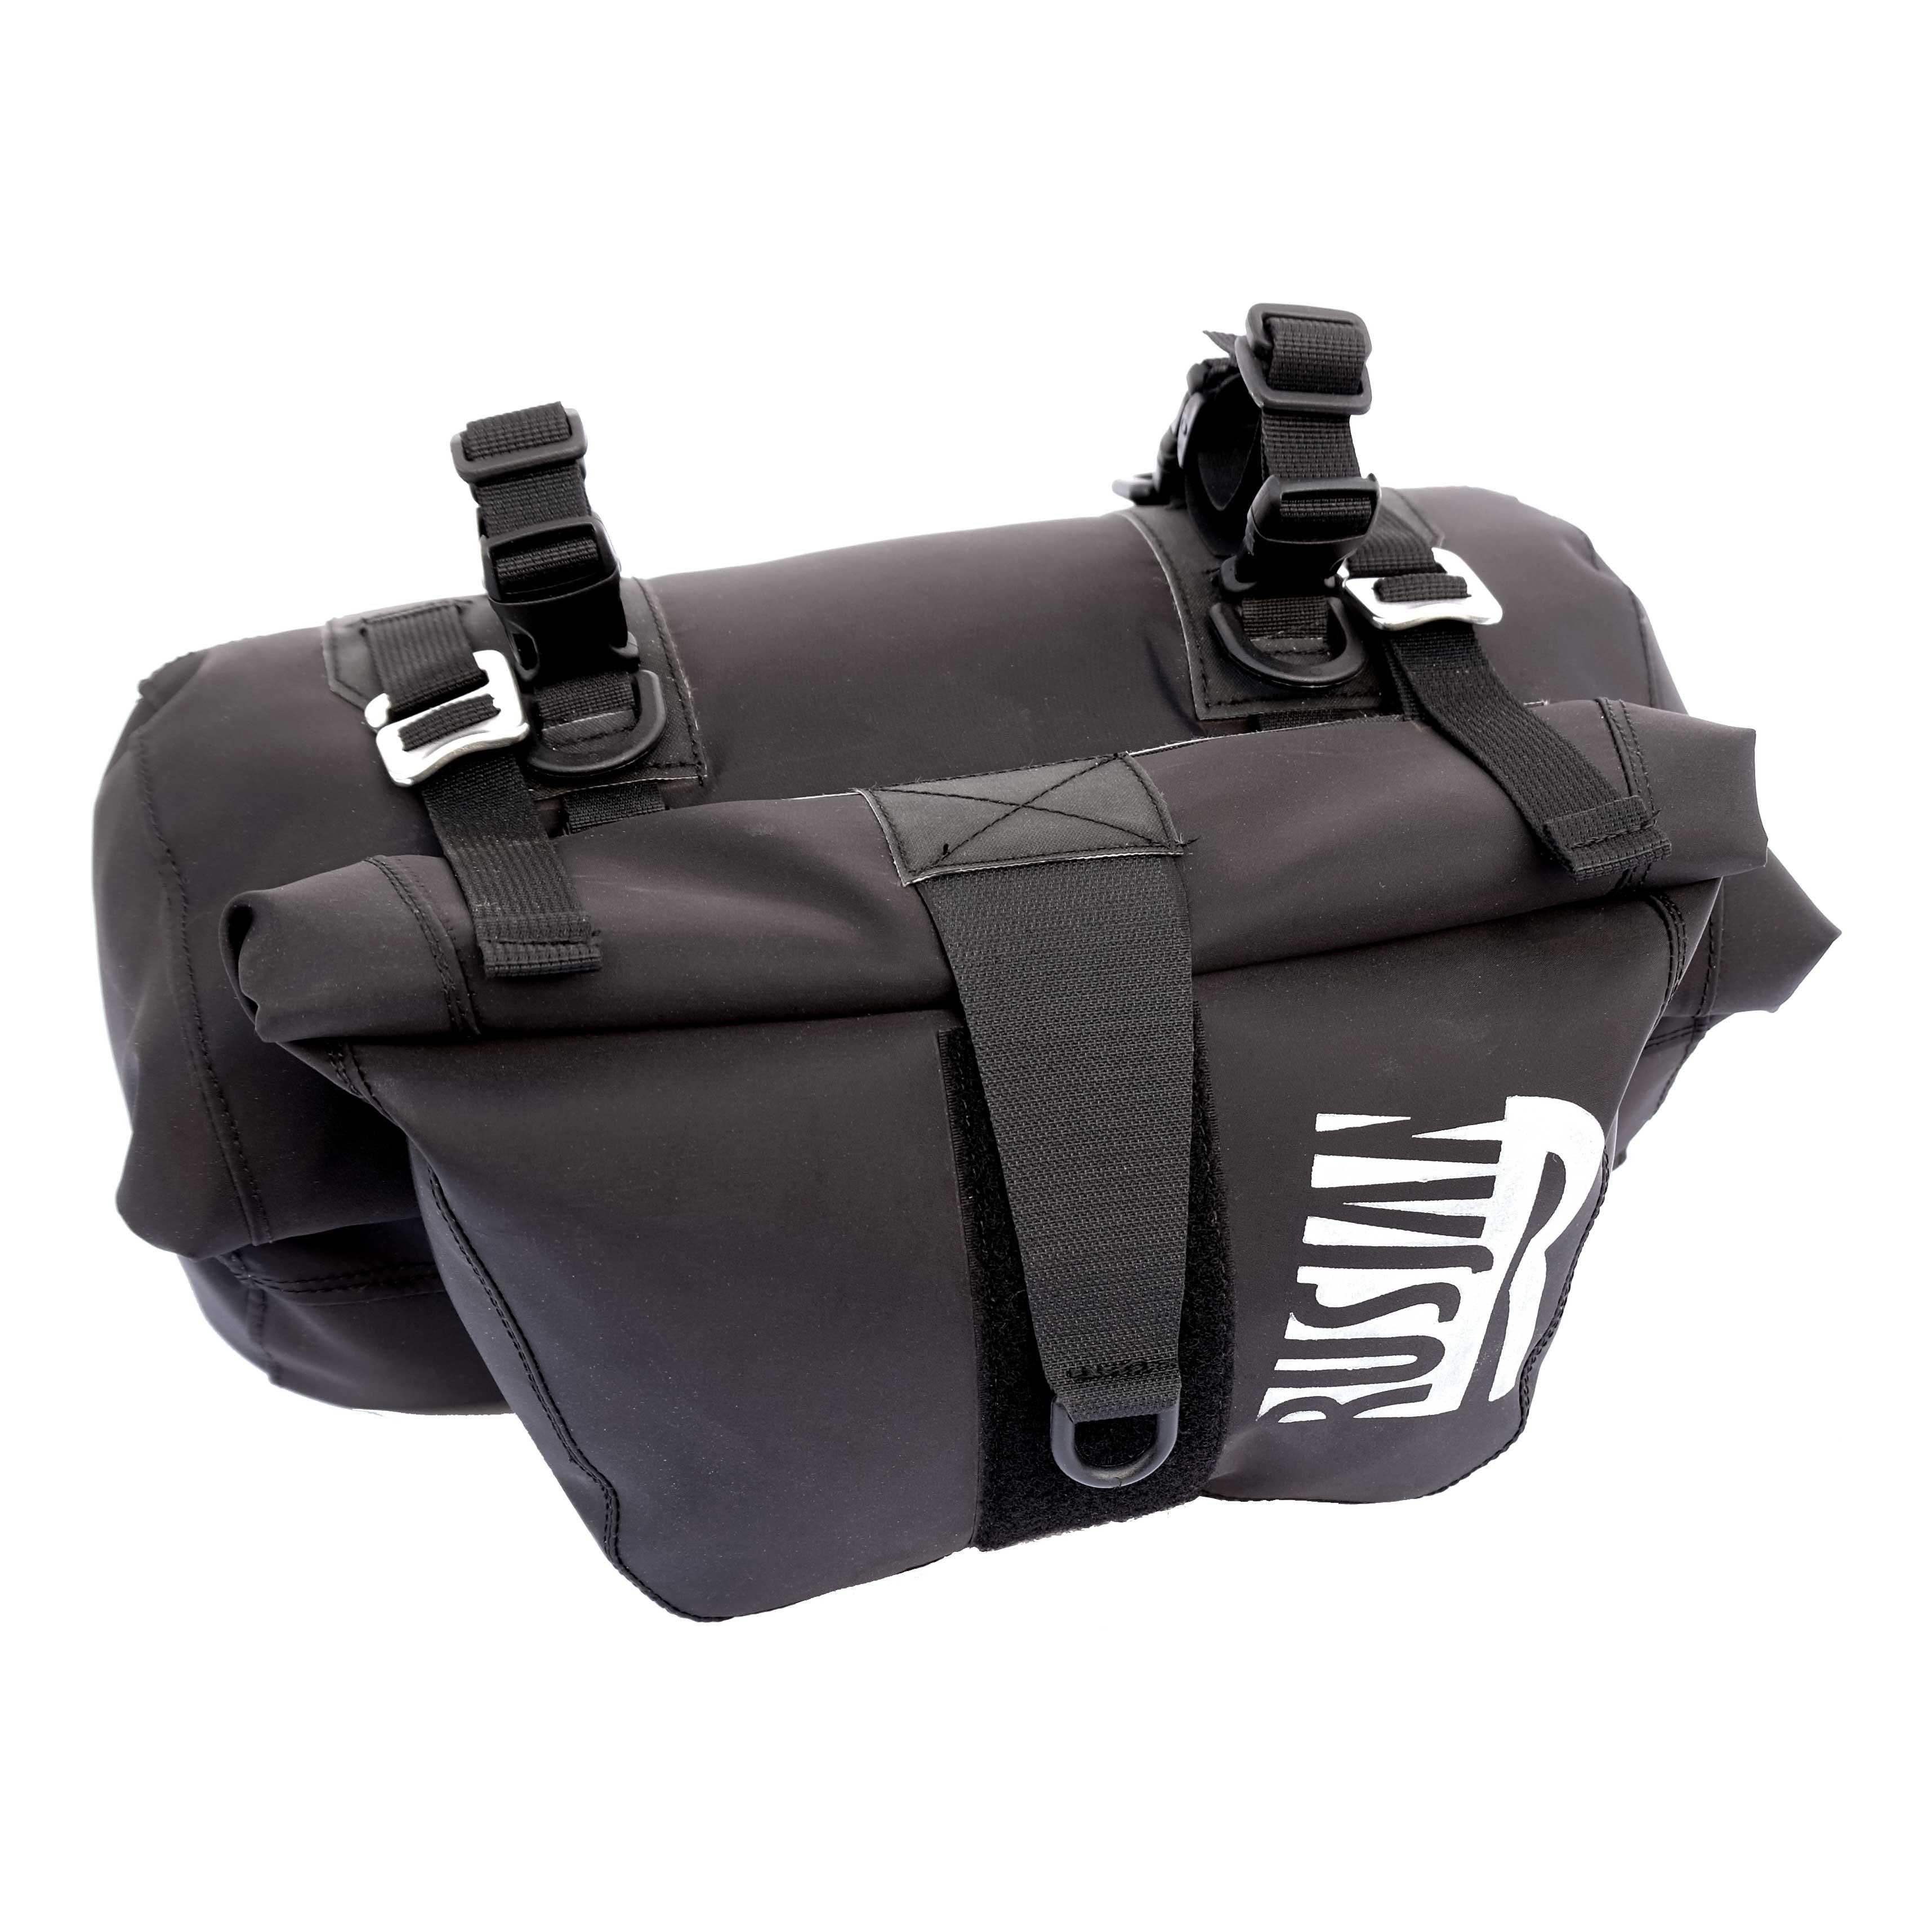 Borsa da manubrio con tasca frontale waterproof per bikepacking